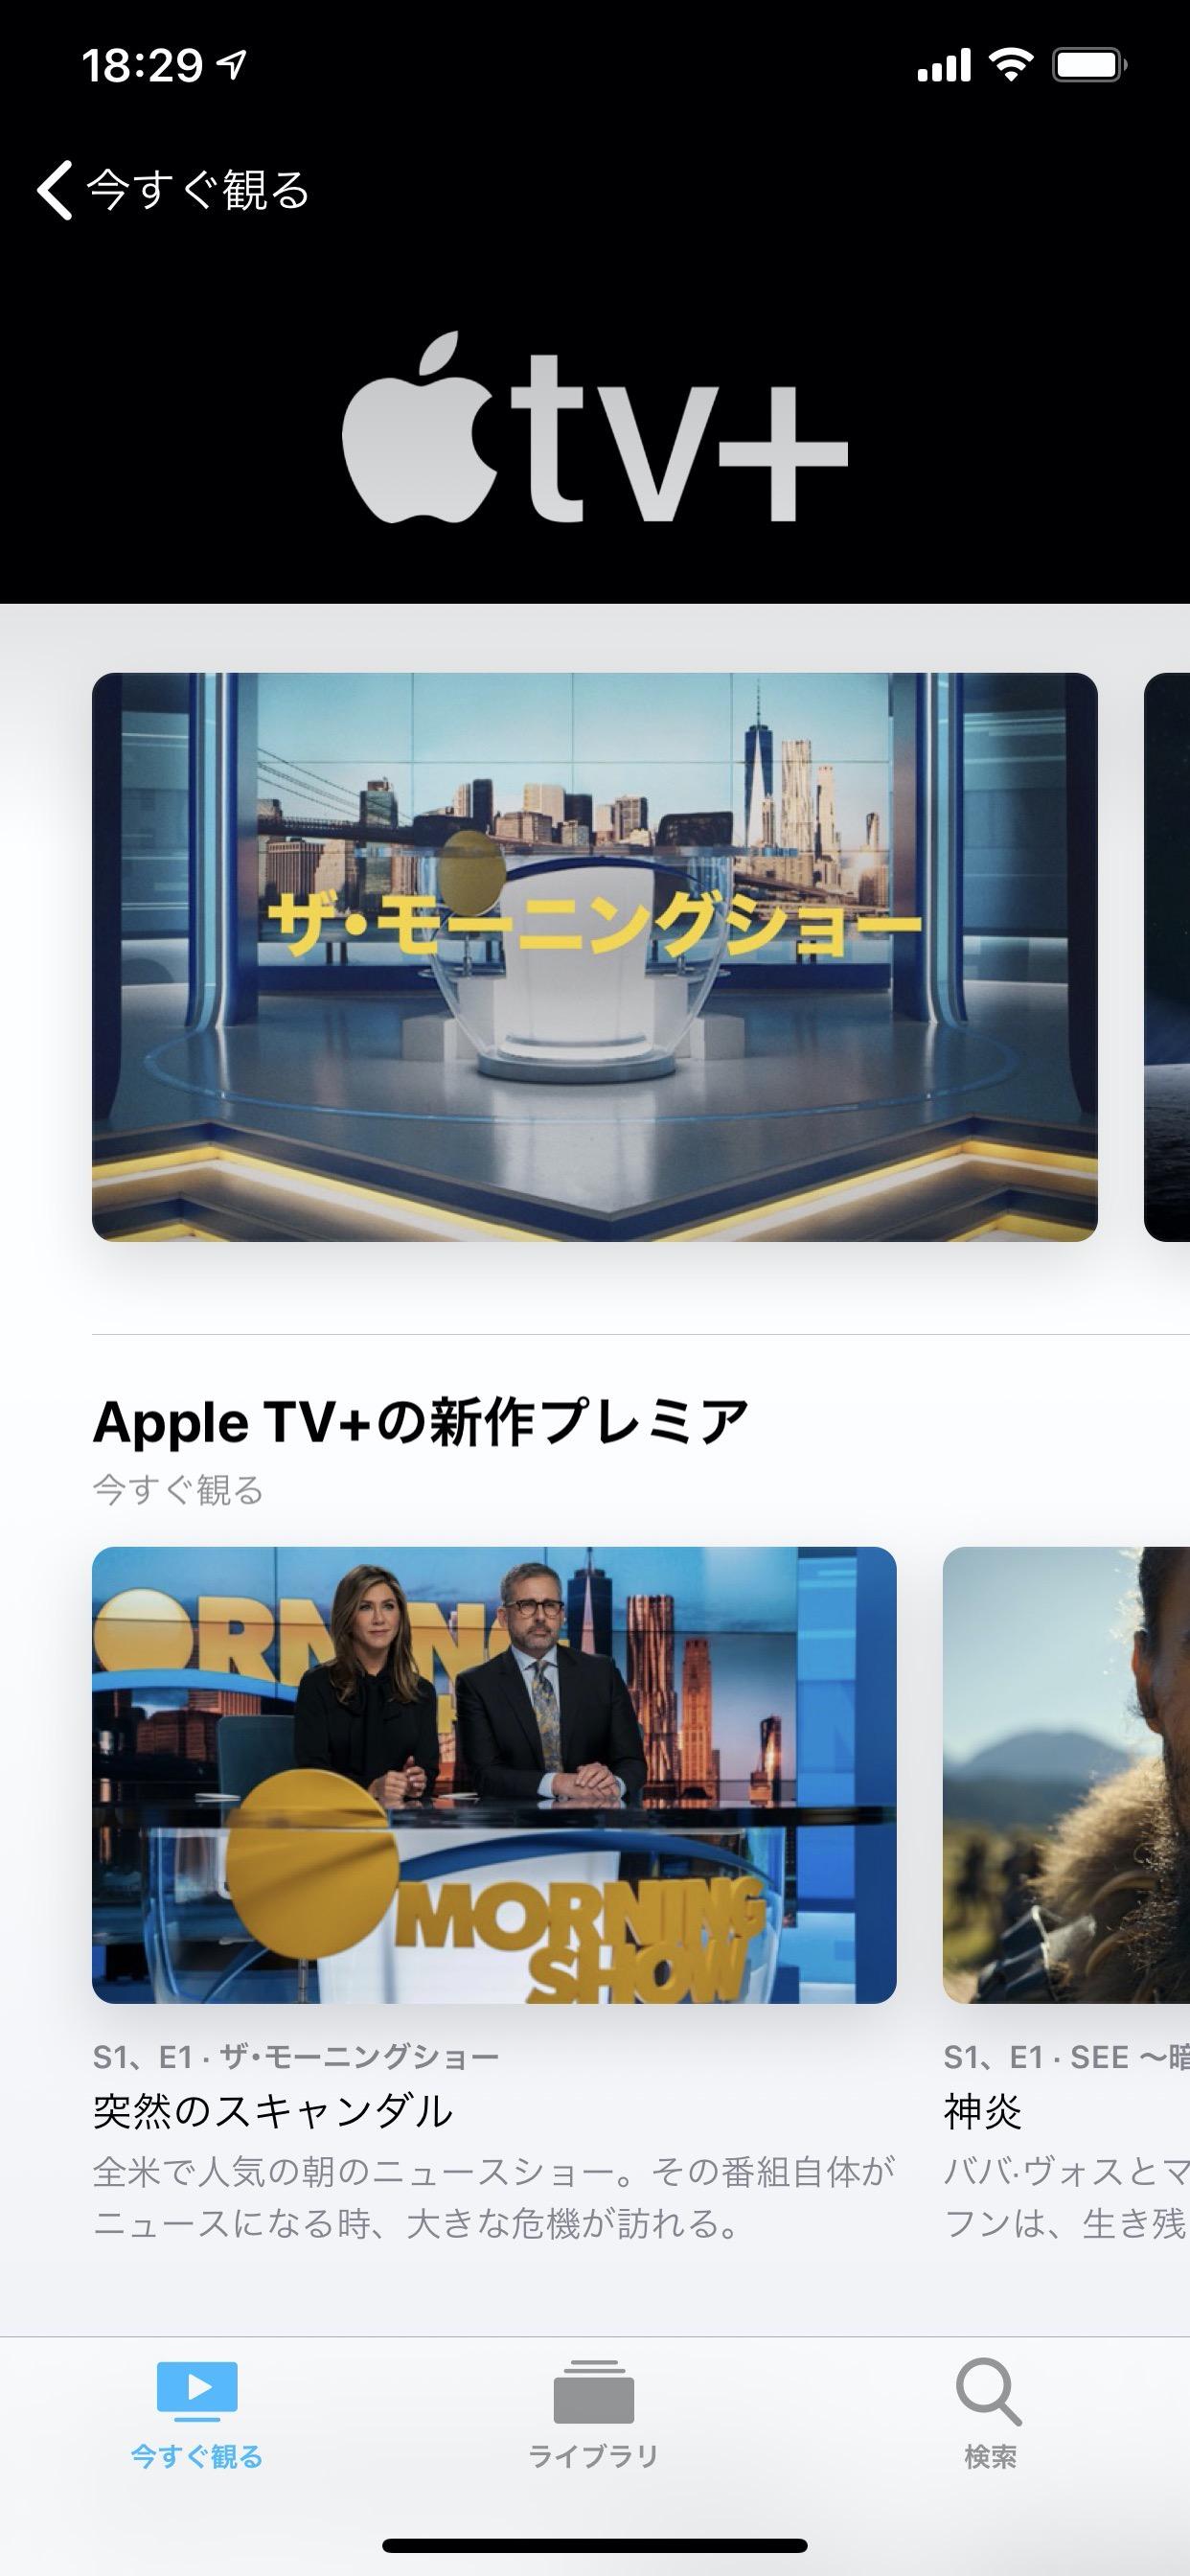 「Apple TV+」Appleの動画配信サービスが開始